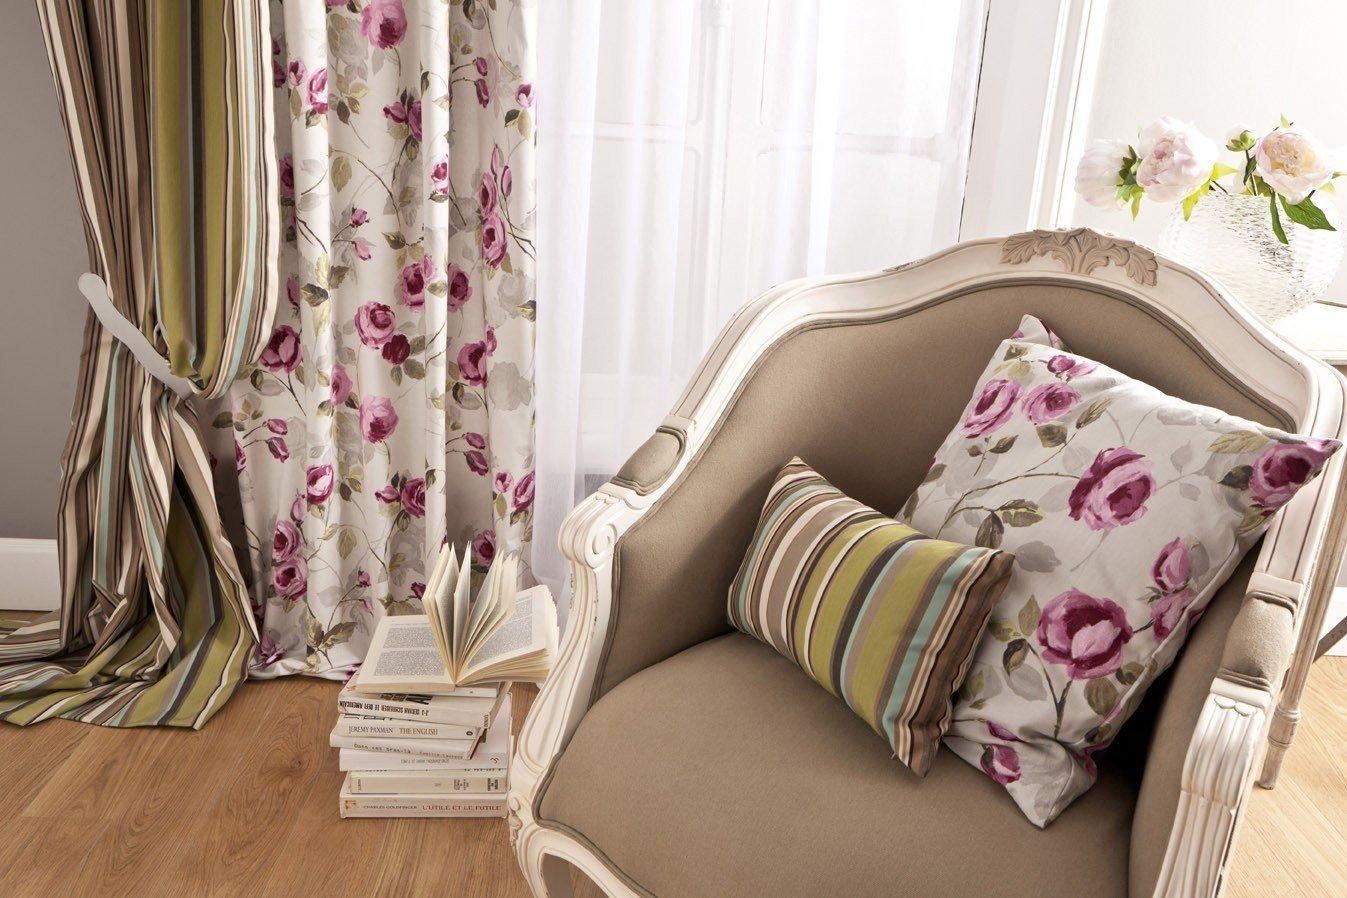 Estampas florais nas cortinas prego e martelo